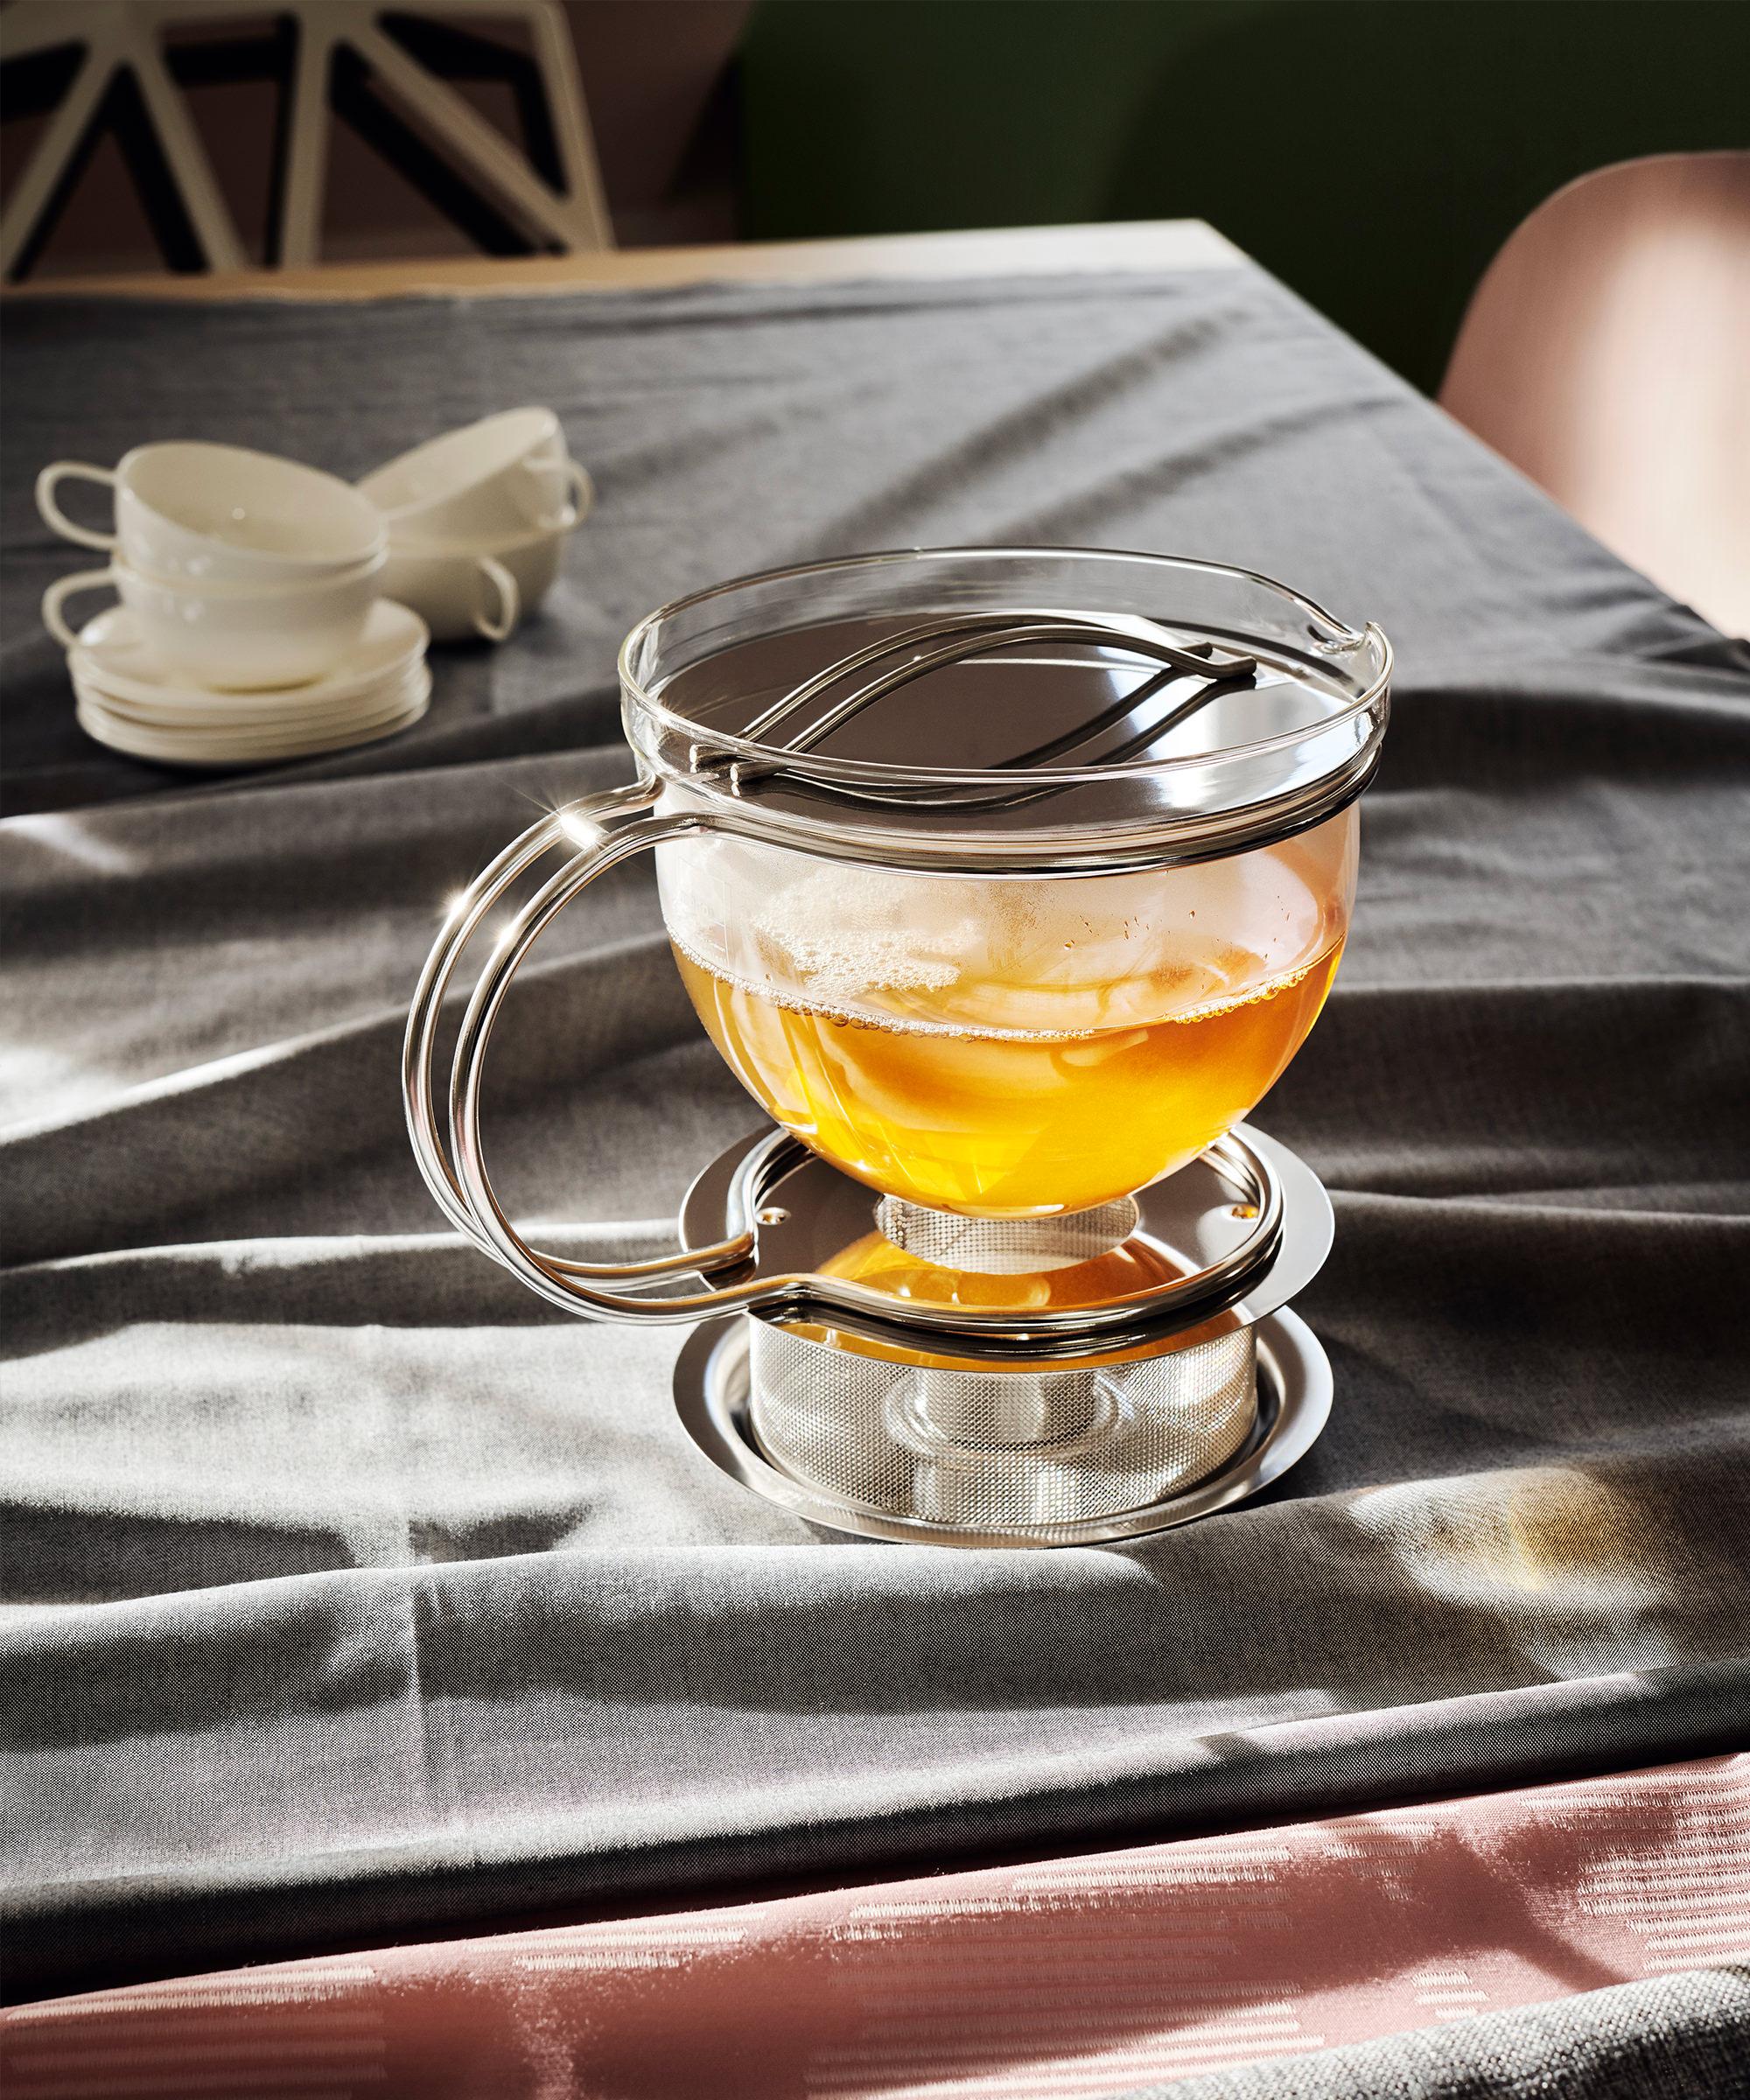 44444 Mono Filio Teekanne Teapot